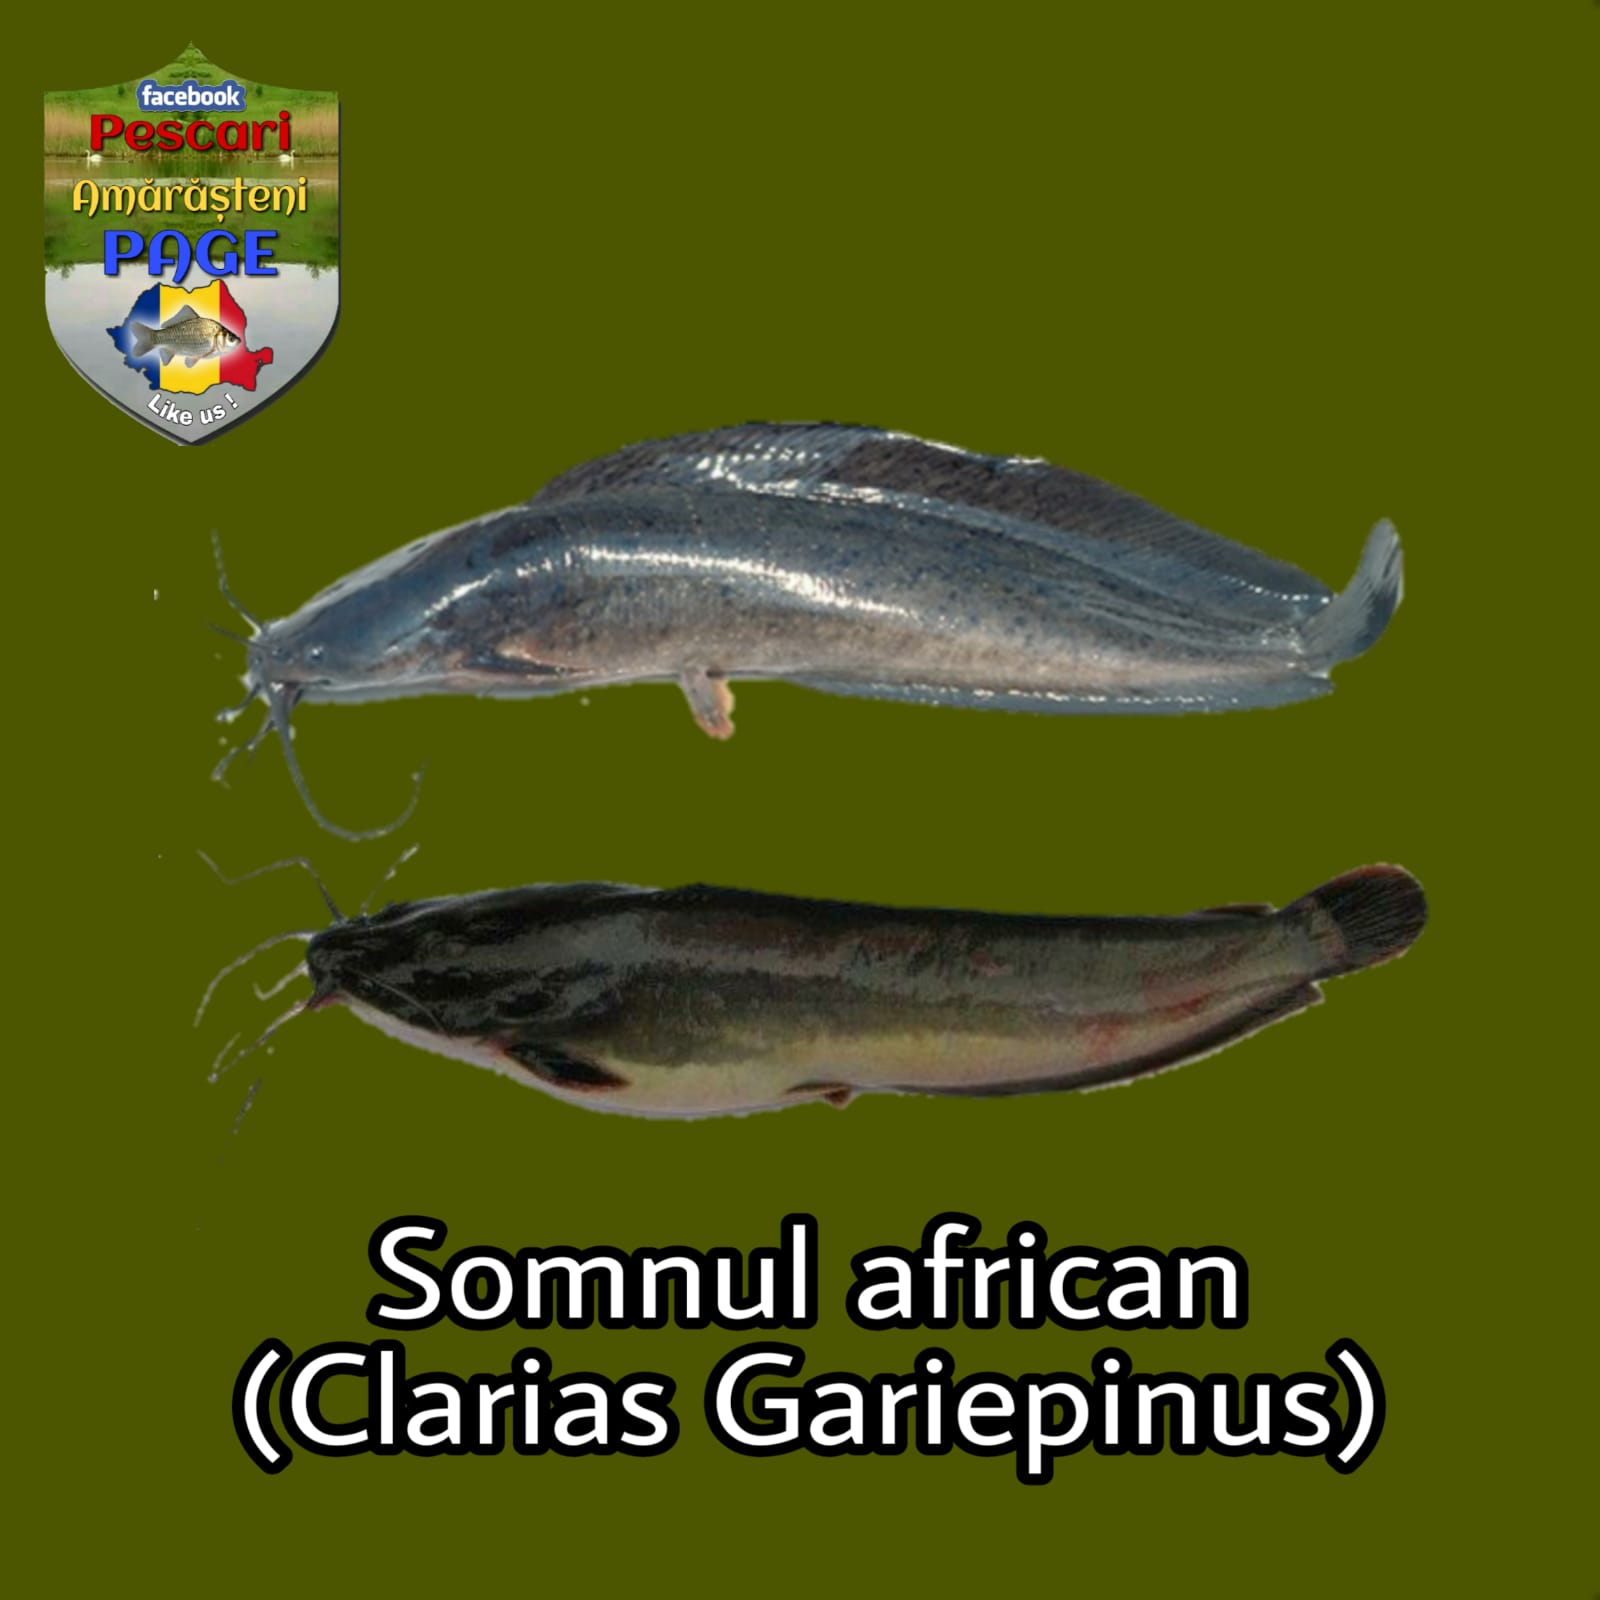 Somnul african (Clarias gariepinus)